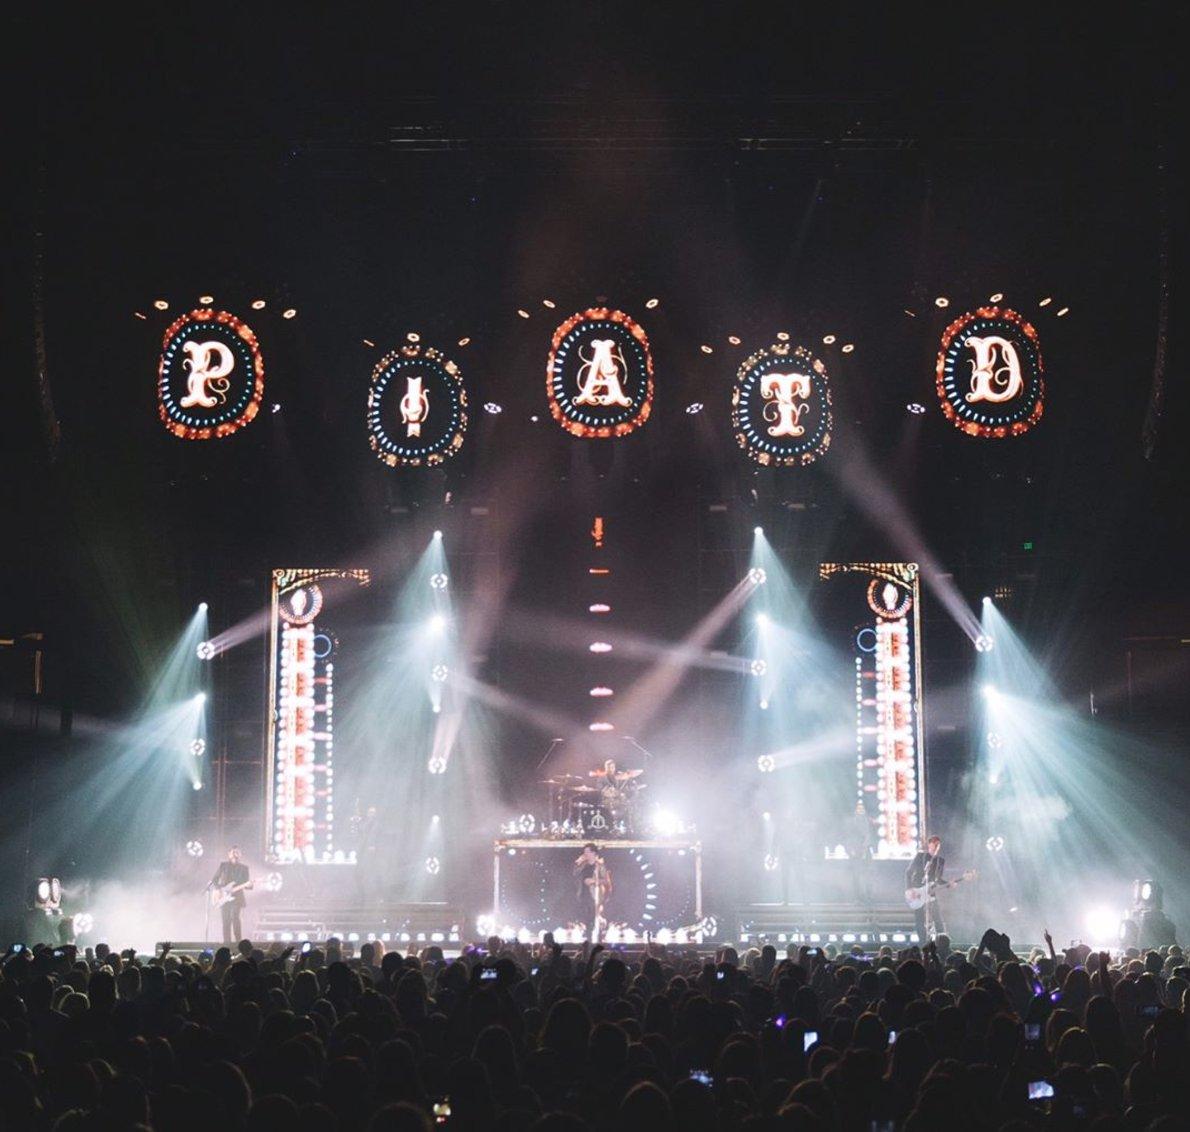 Birmingham AL. ��- @jakechams #deathofabachelortour https://t.co/fQ53bnM2uW